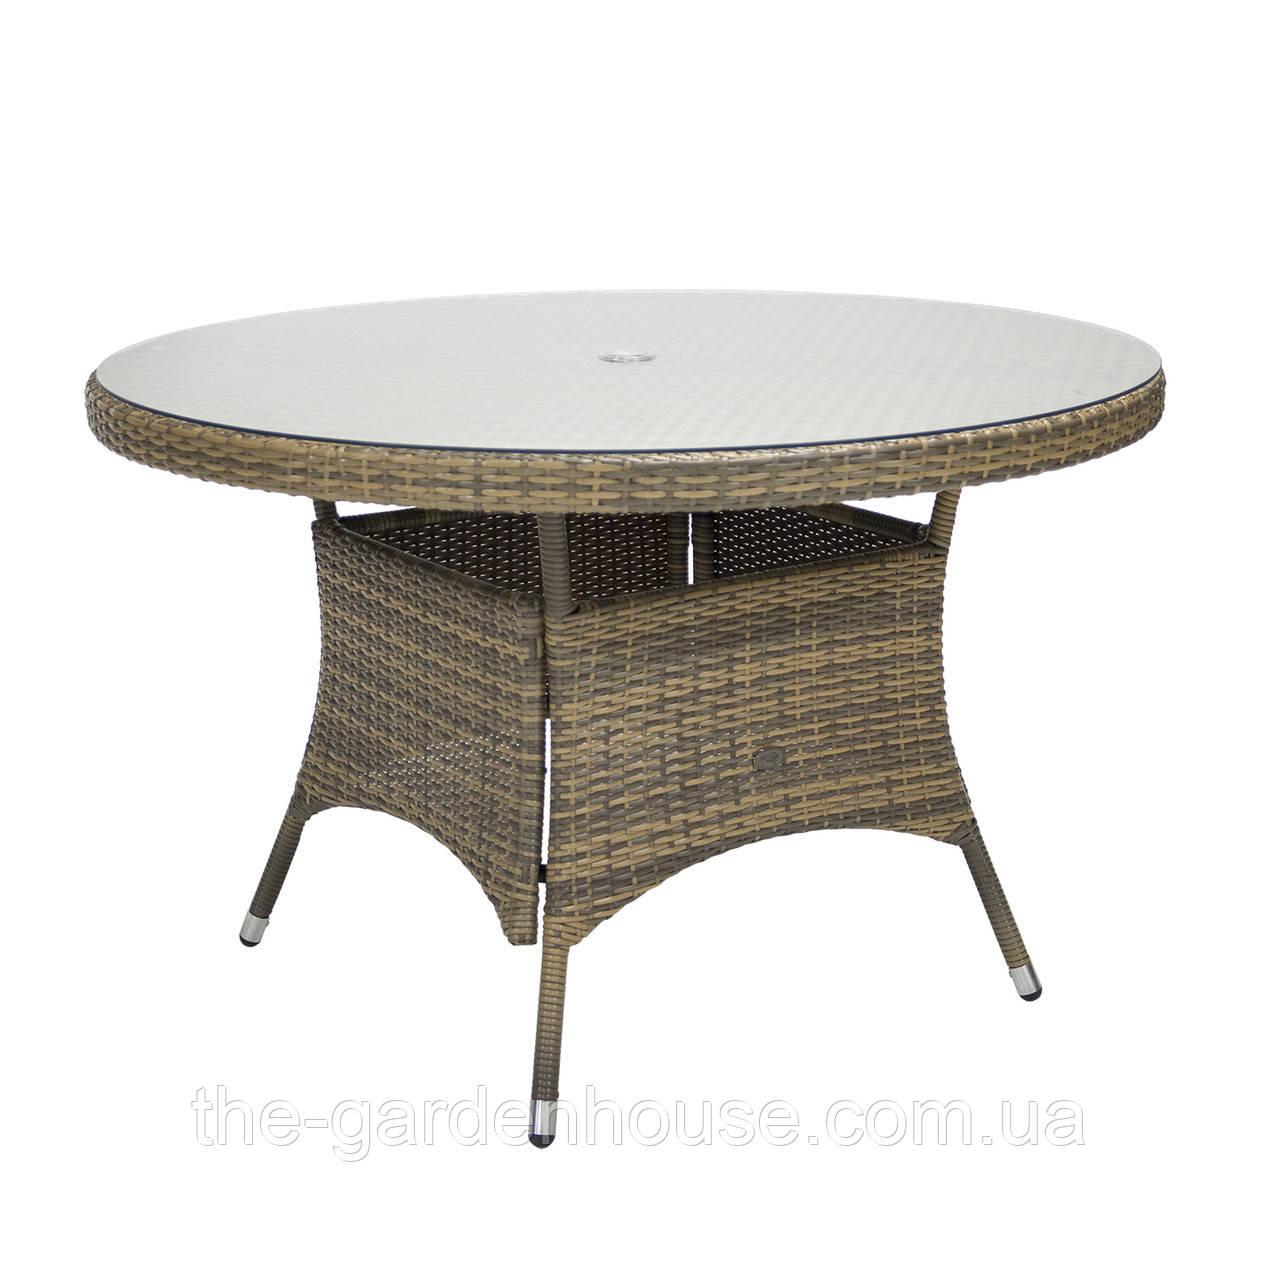 Обеденный стол Wicker из техноротанга Ø 120 см капучино